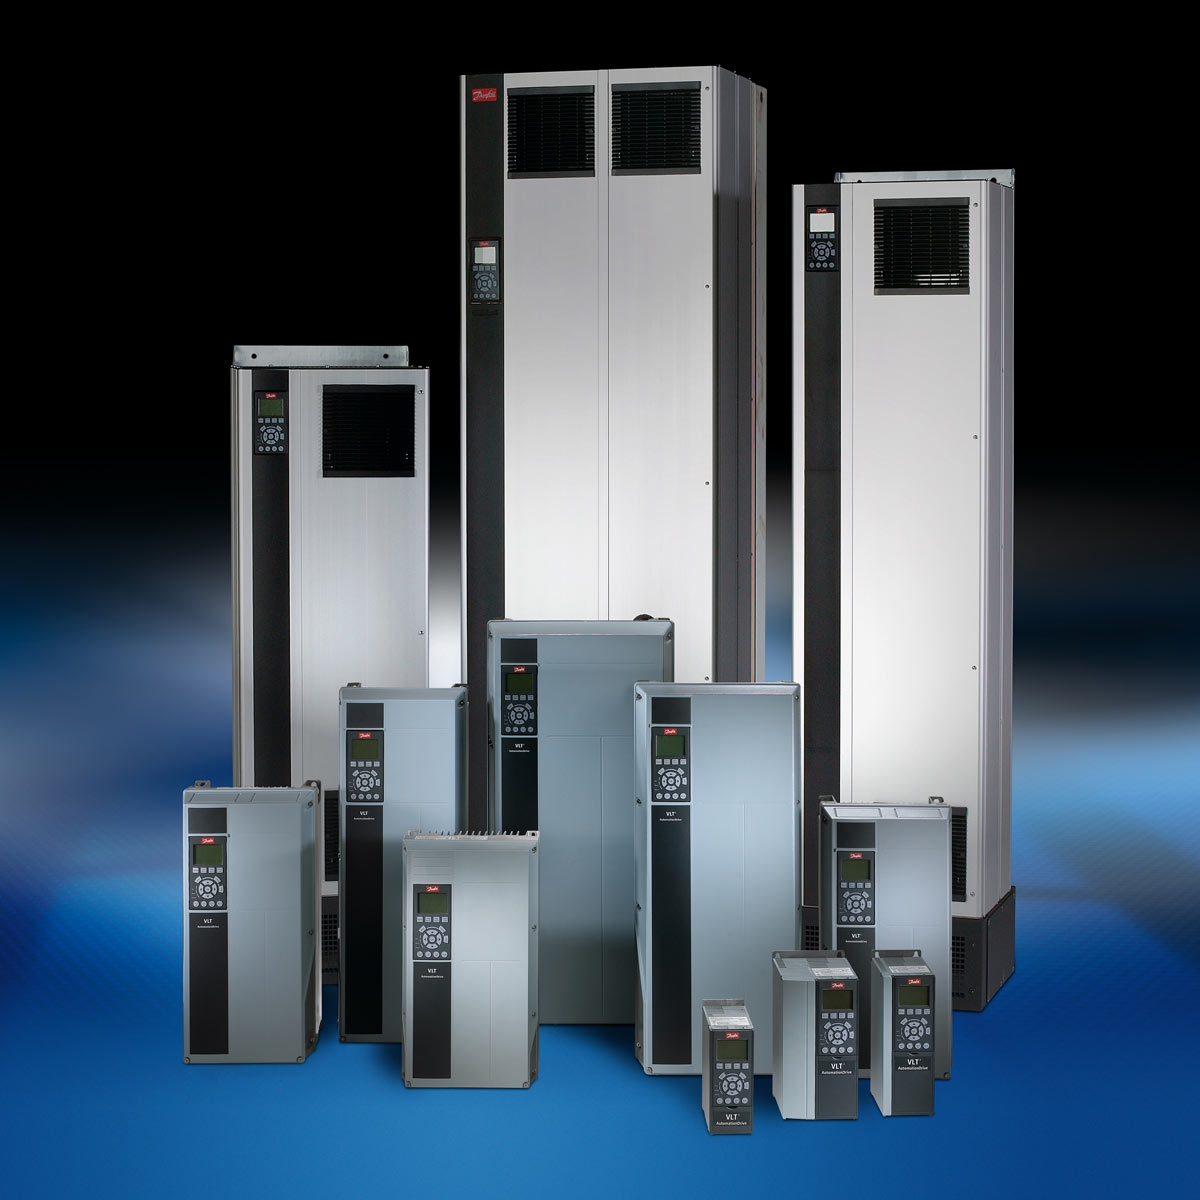 The Danfoss VLT® AutomationDrive FC302.